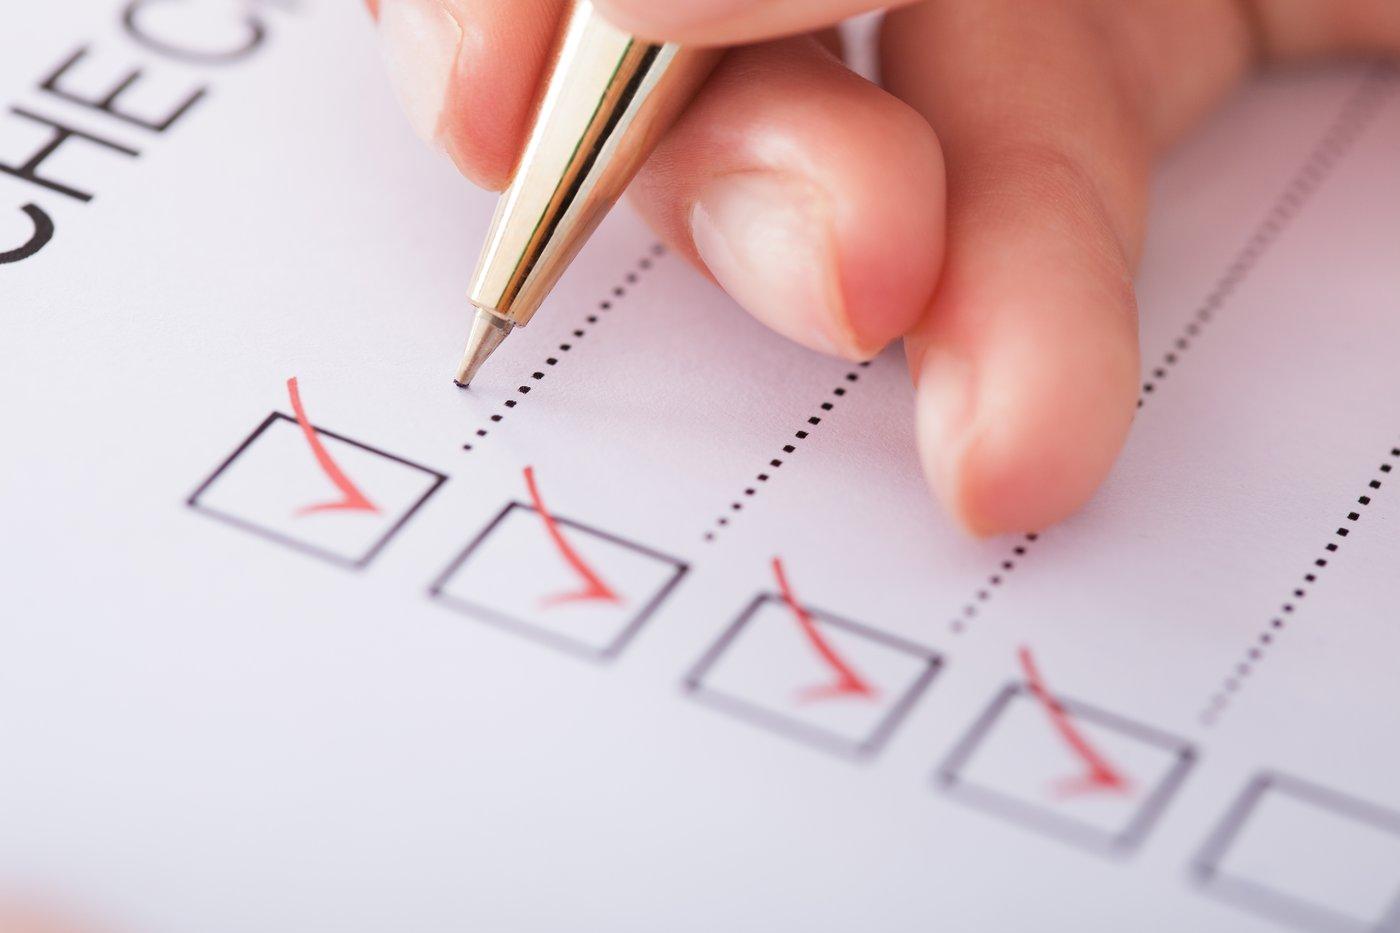 Woman Creating an Office 365 Migraton Checklist